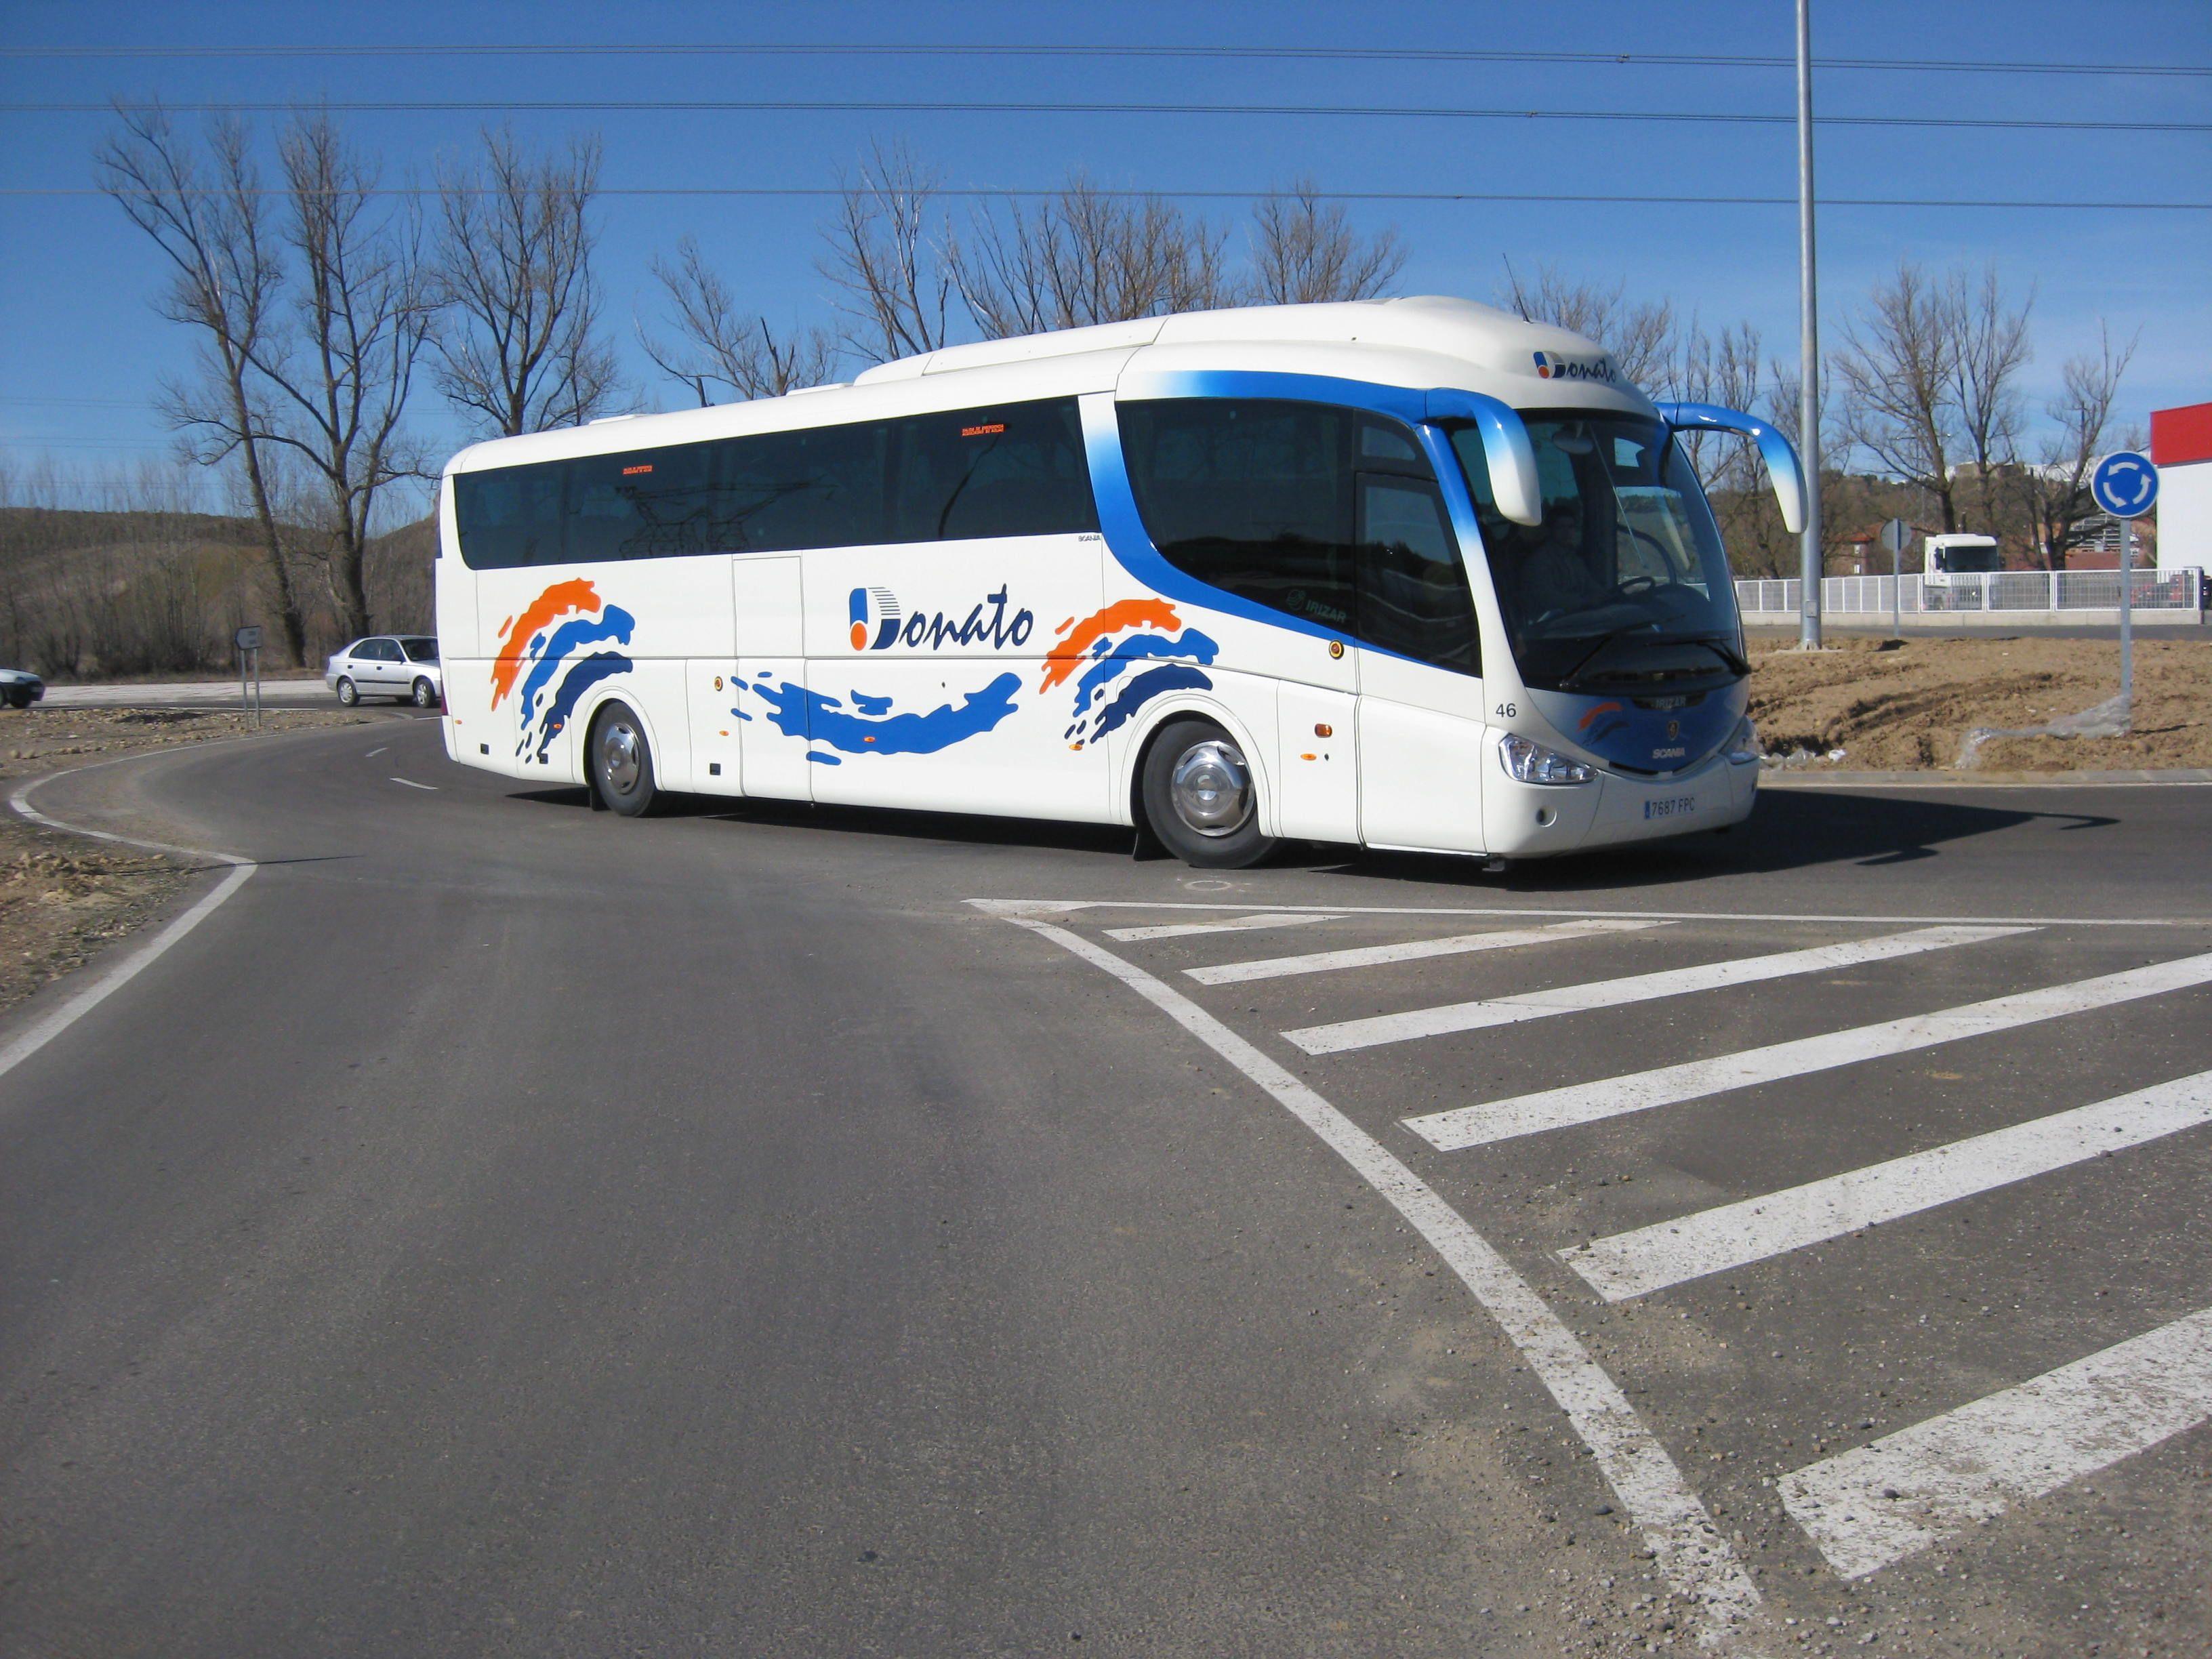 Foto 21 de Autocares en  | Taxis Donato